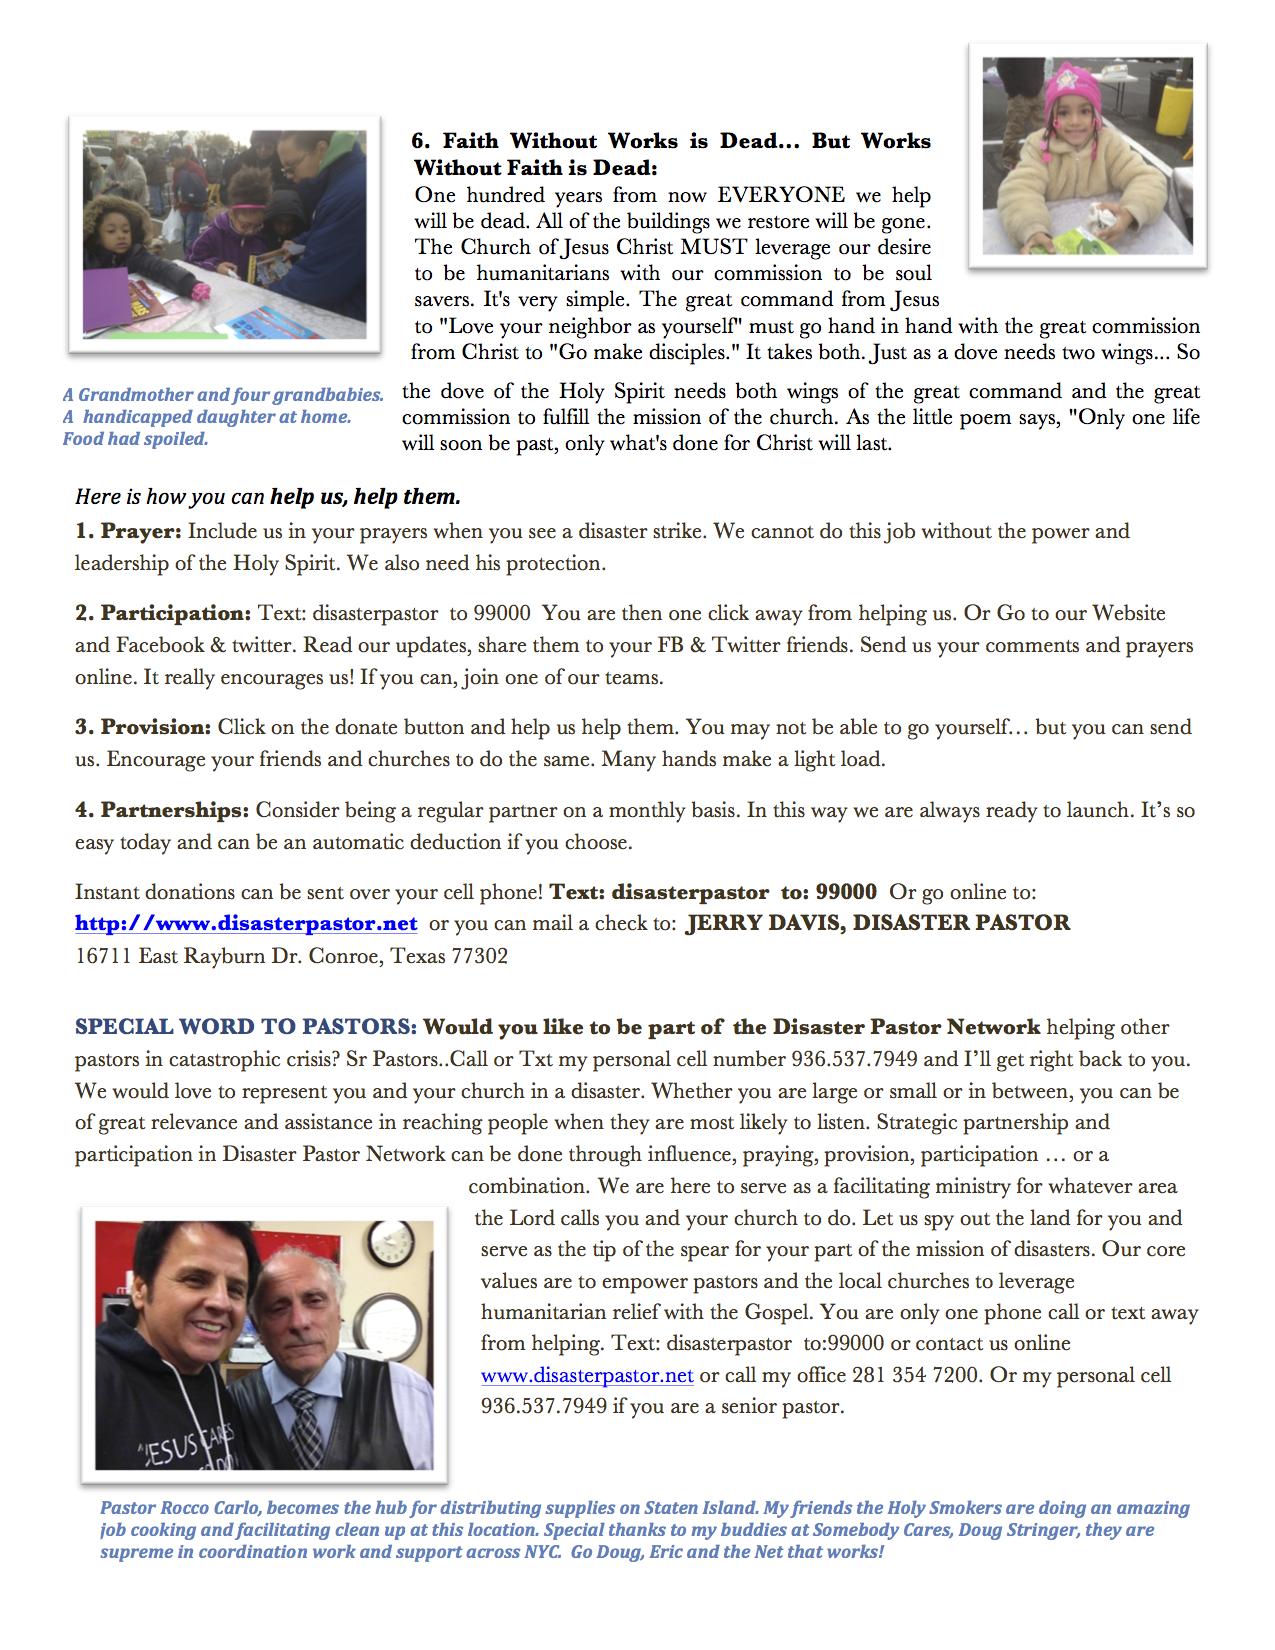 NYNJSandyNewsletter3.png